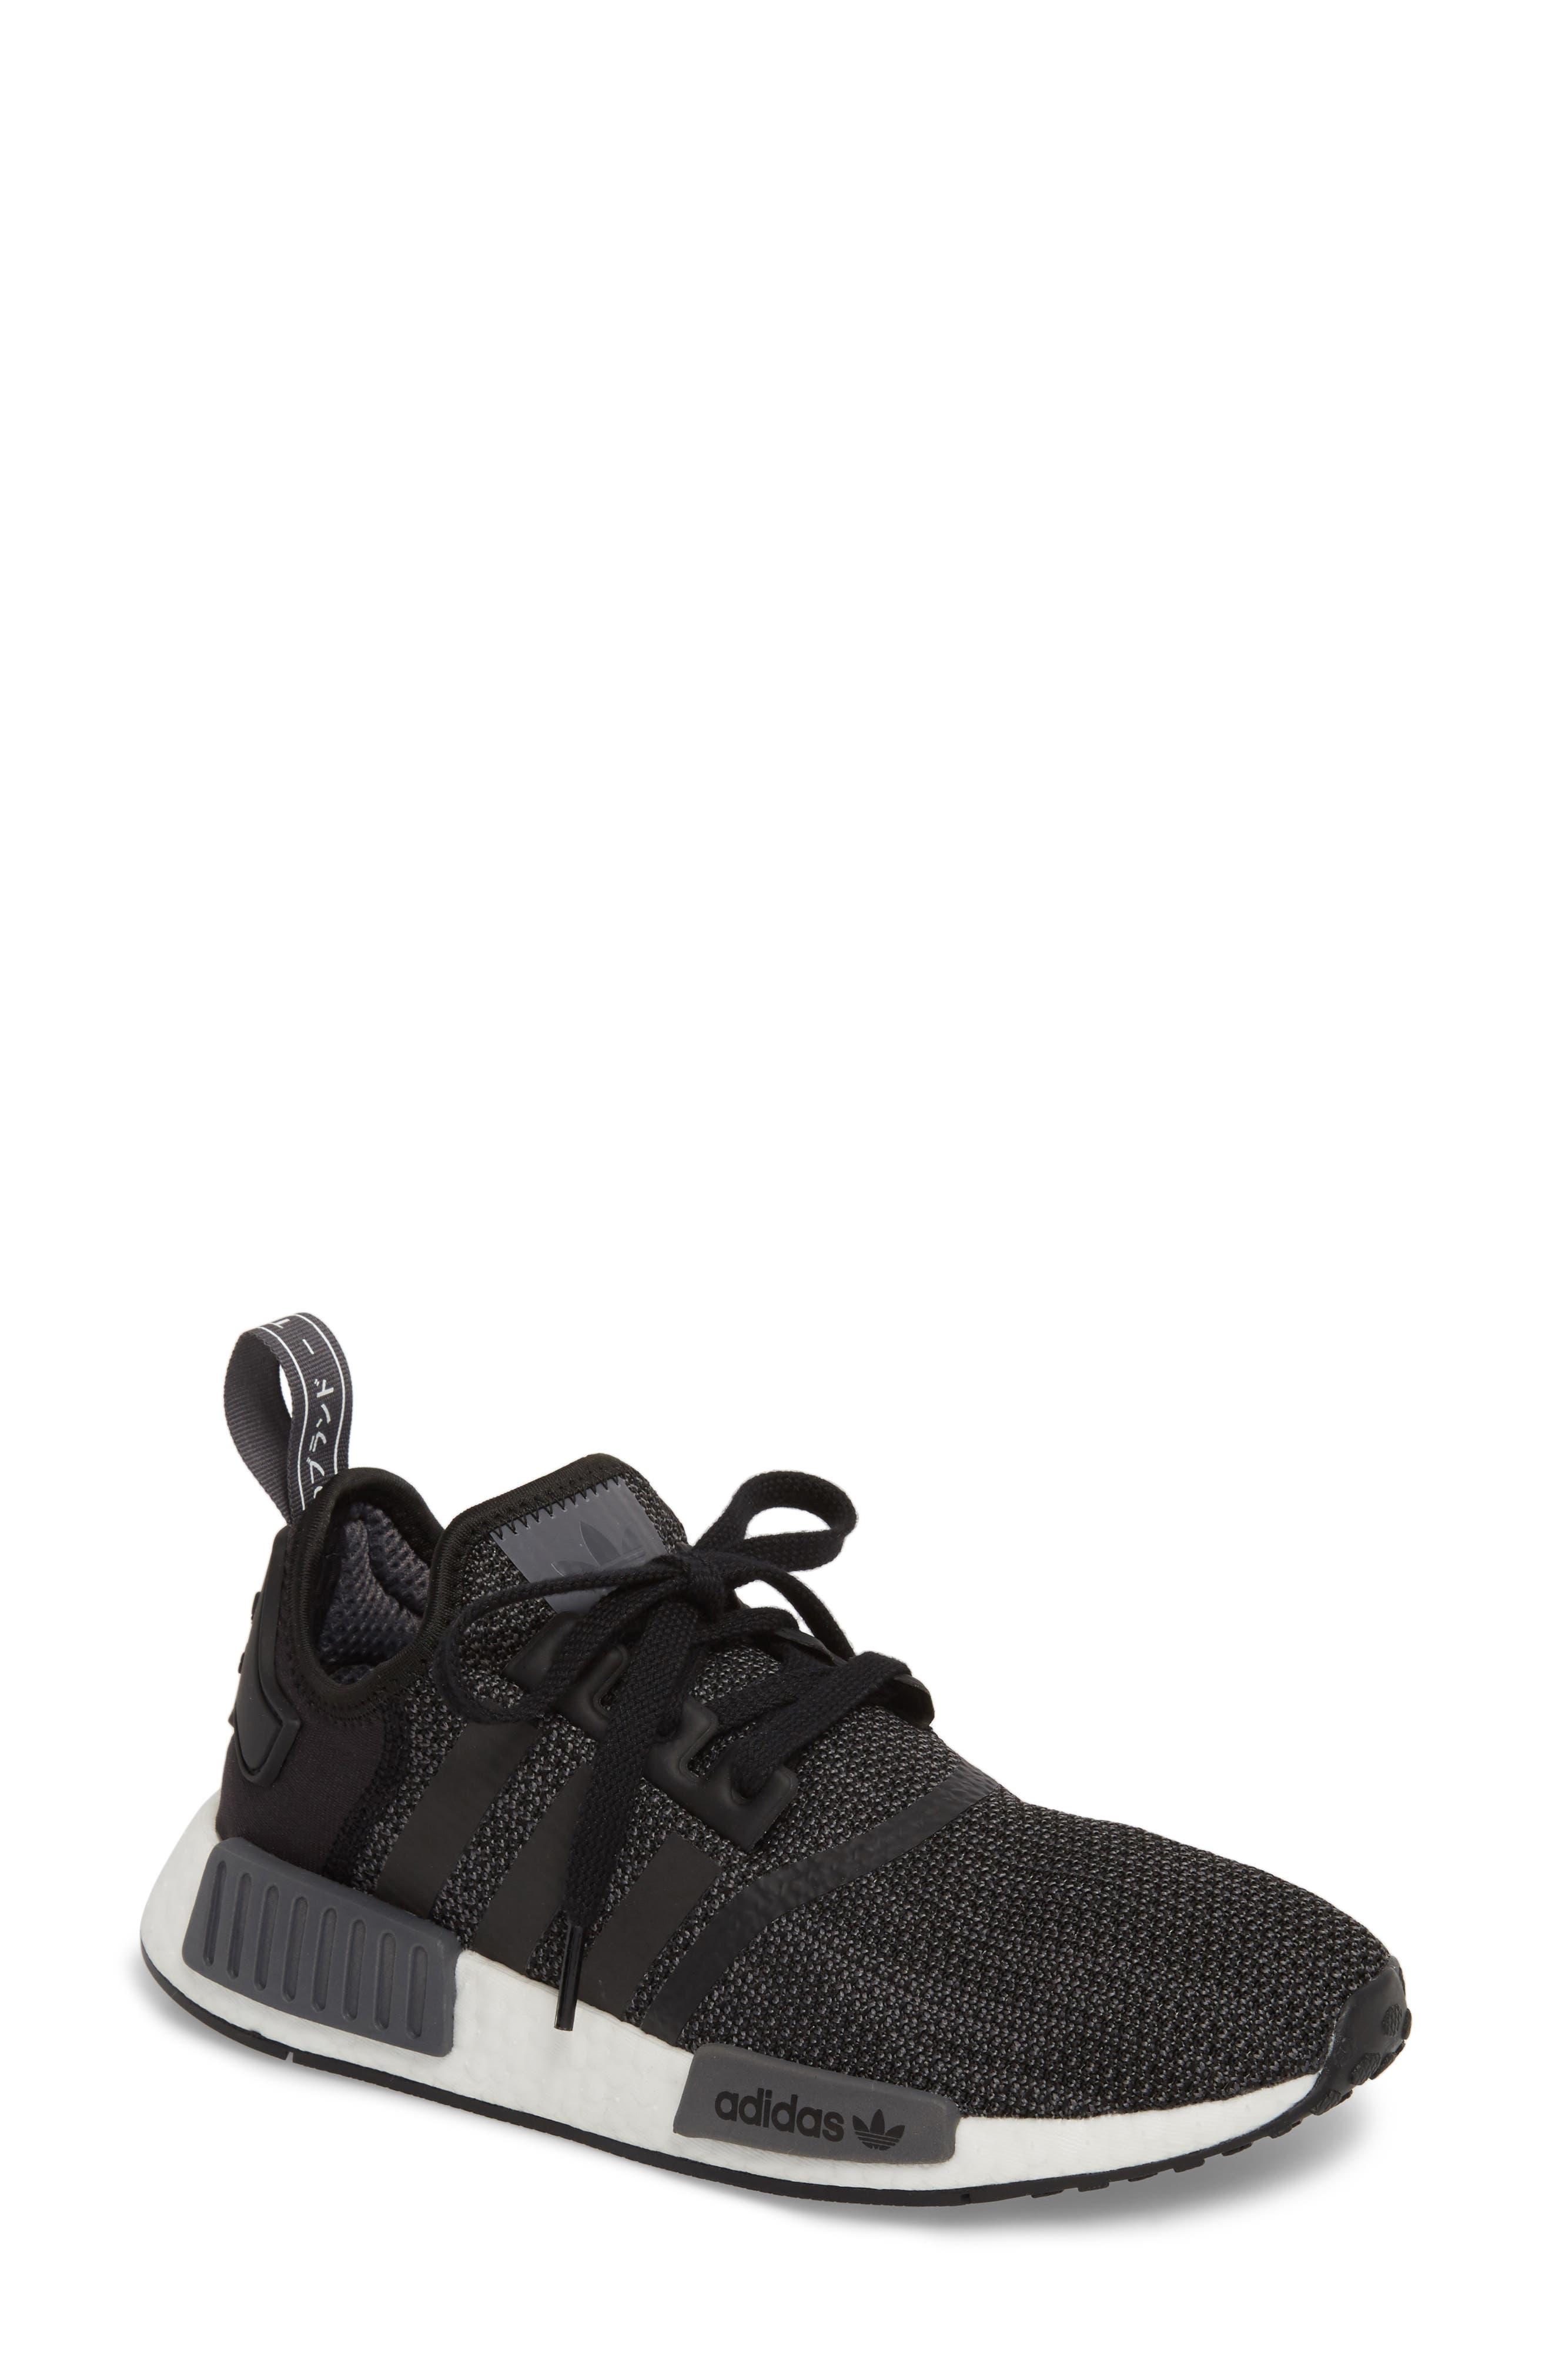 adidas NMD R1 Athletic Shoe (Women). BLACK/ CARBON/ WHITE ...